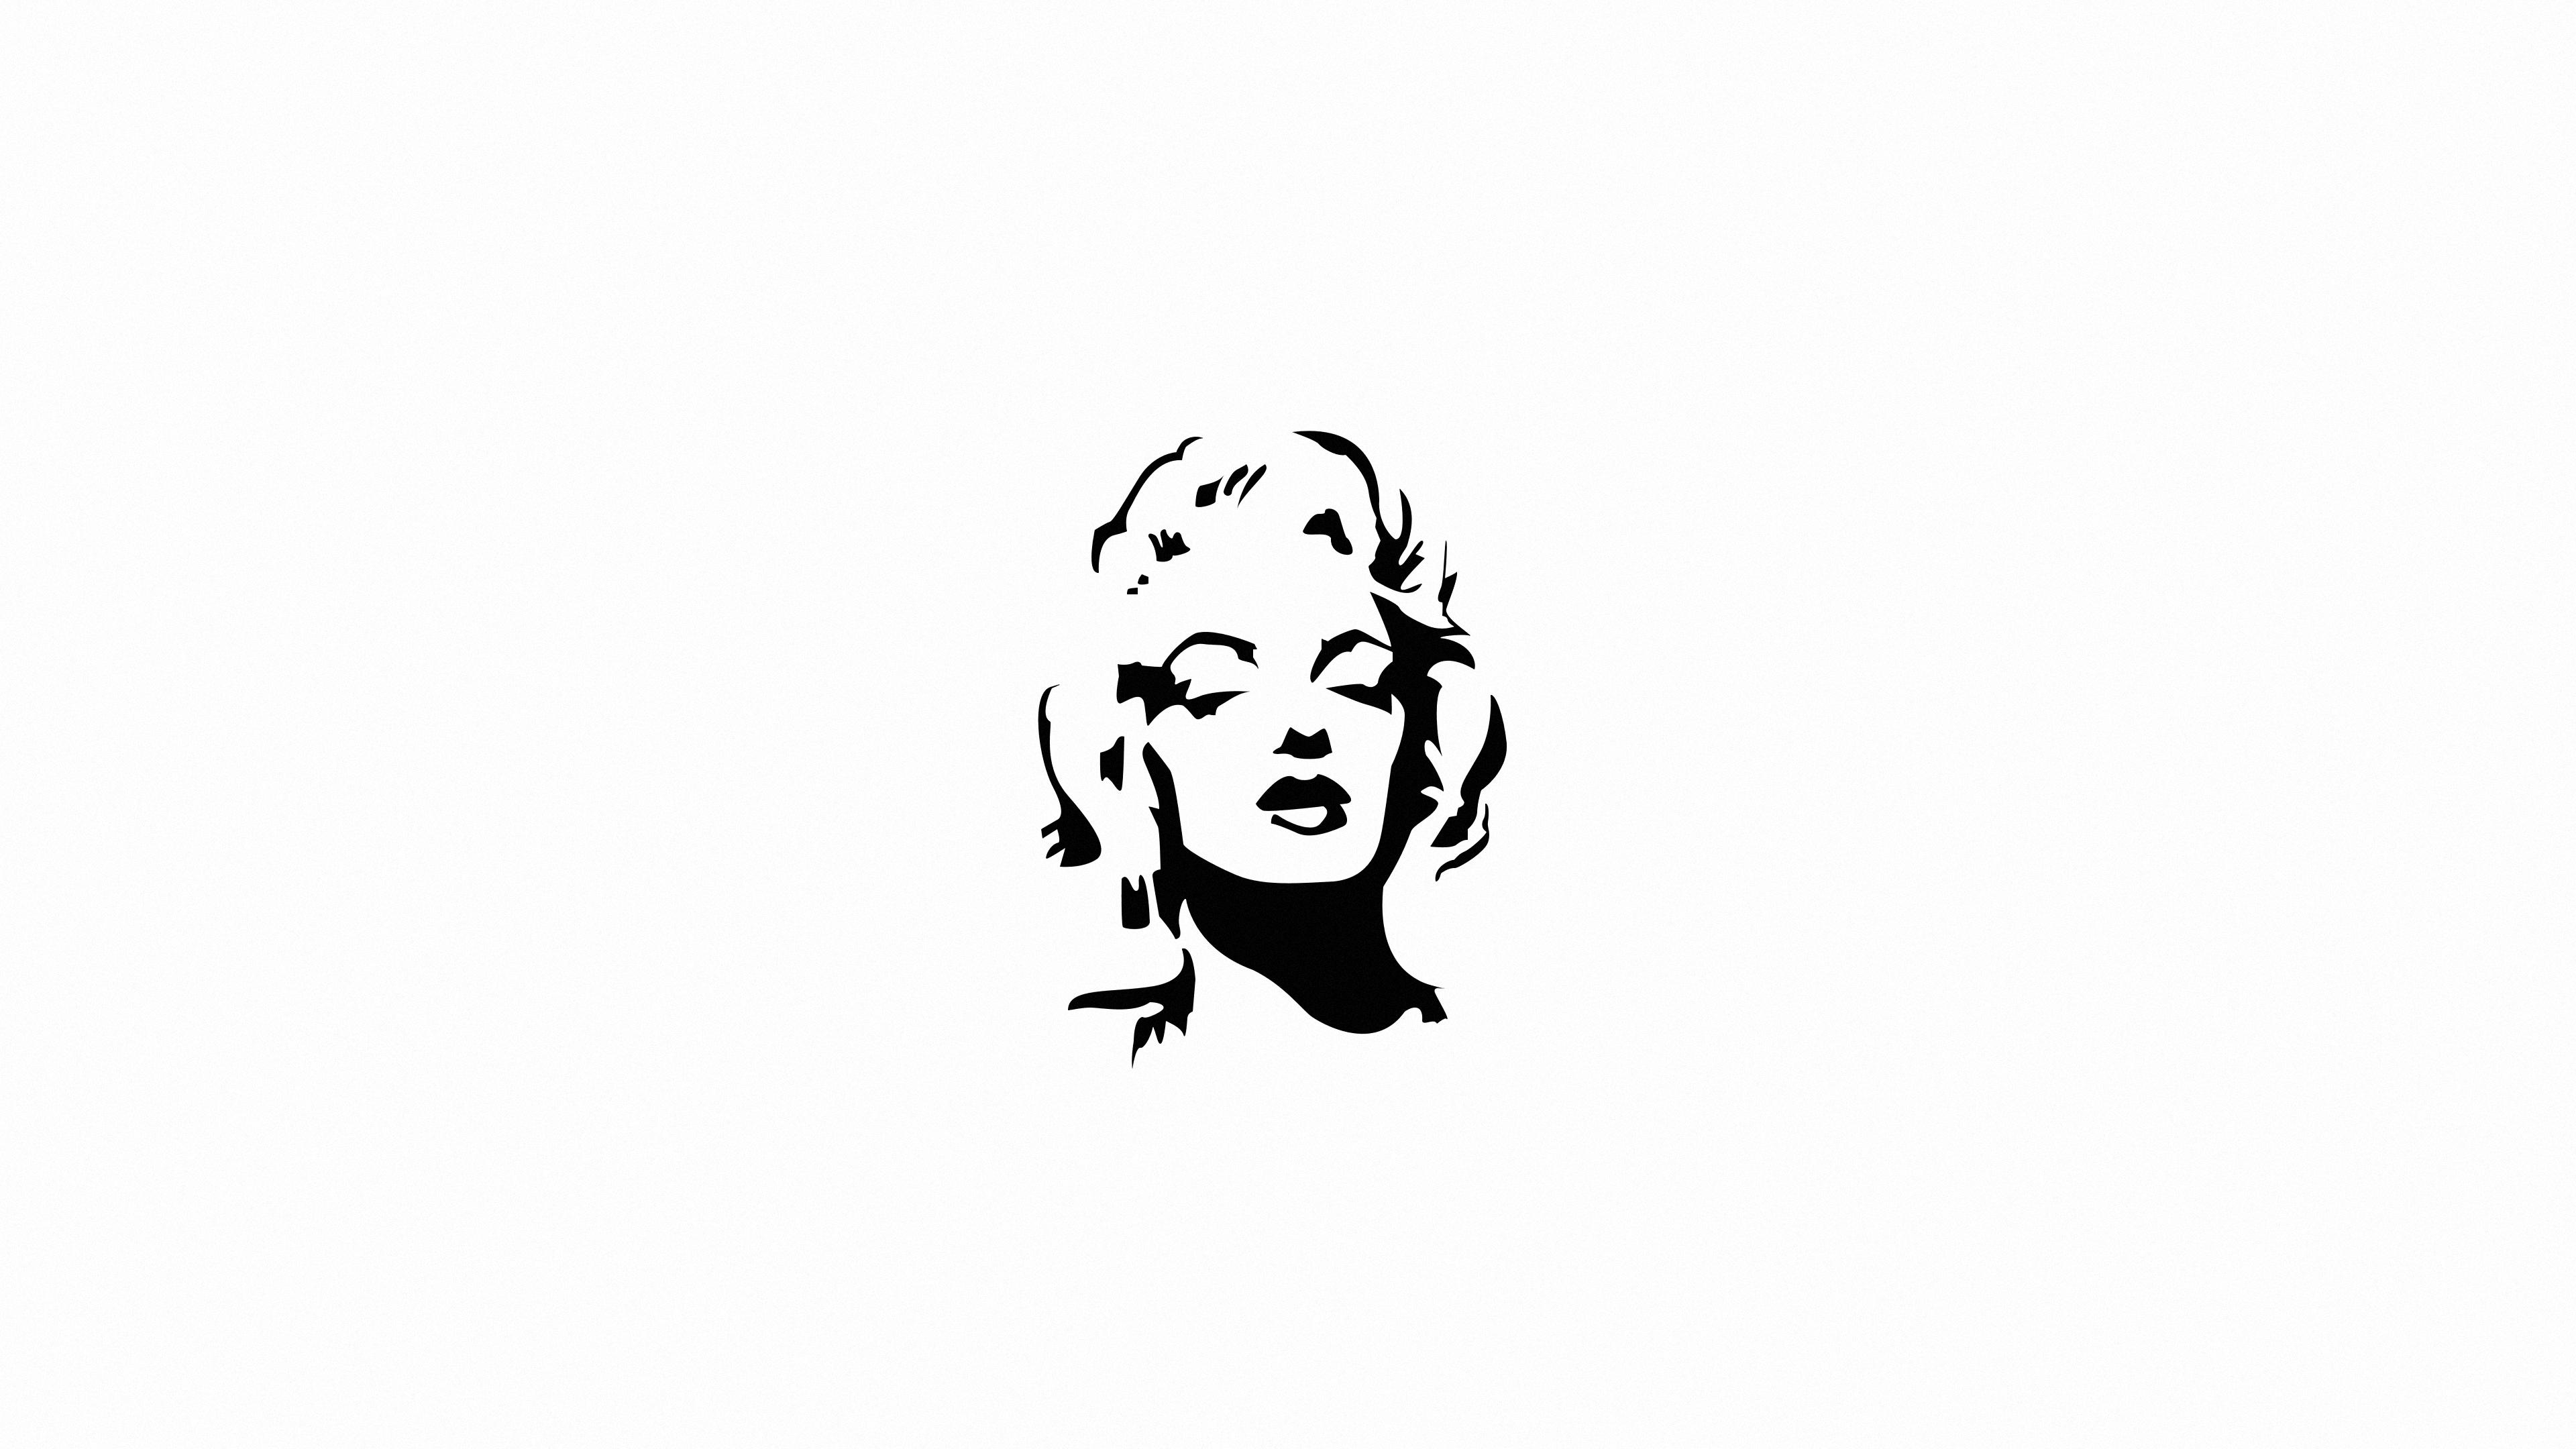 marilyn monroe monochrome minimal 4k 1618131614 - Marilyn Monroe Monochrome Minimal 4k - Marilyn Monroe Monochrome Minimal 4k wallpapers